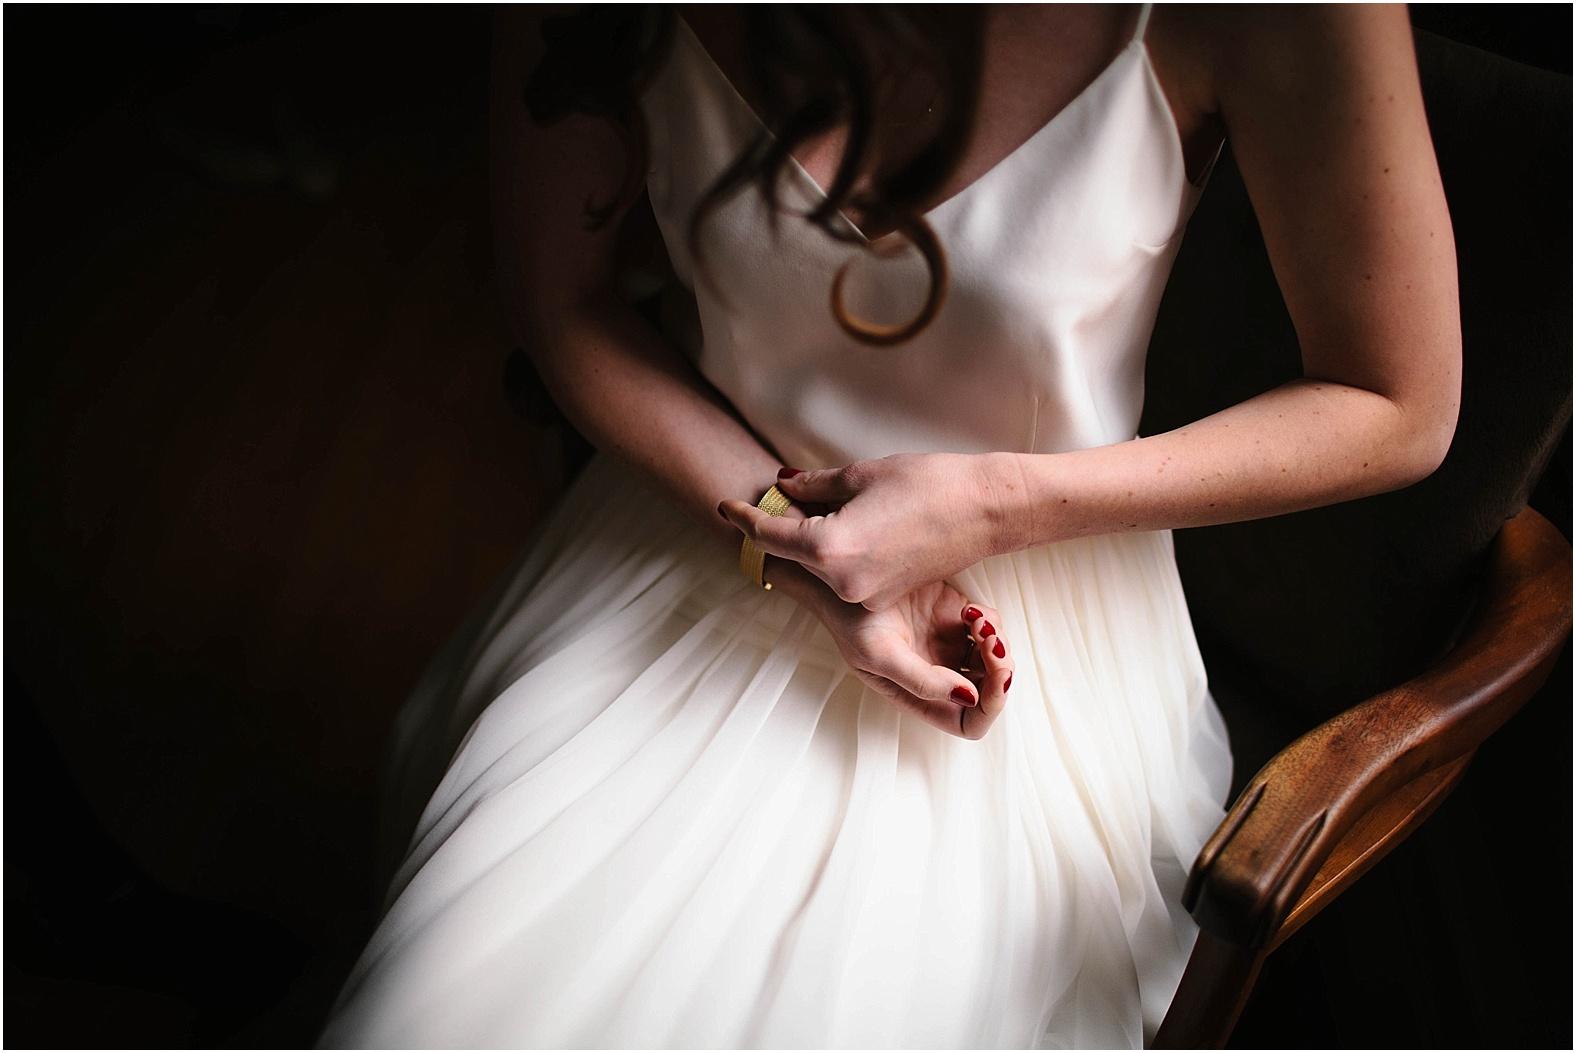 manzanita photo by rebecca caridad internation wedding photogrpaher, colorado wedding photographer, nashville wedding photographer_0594.jpg